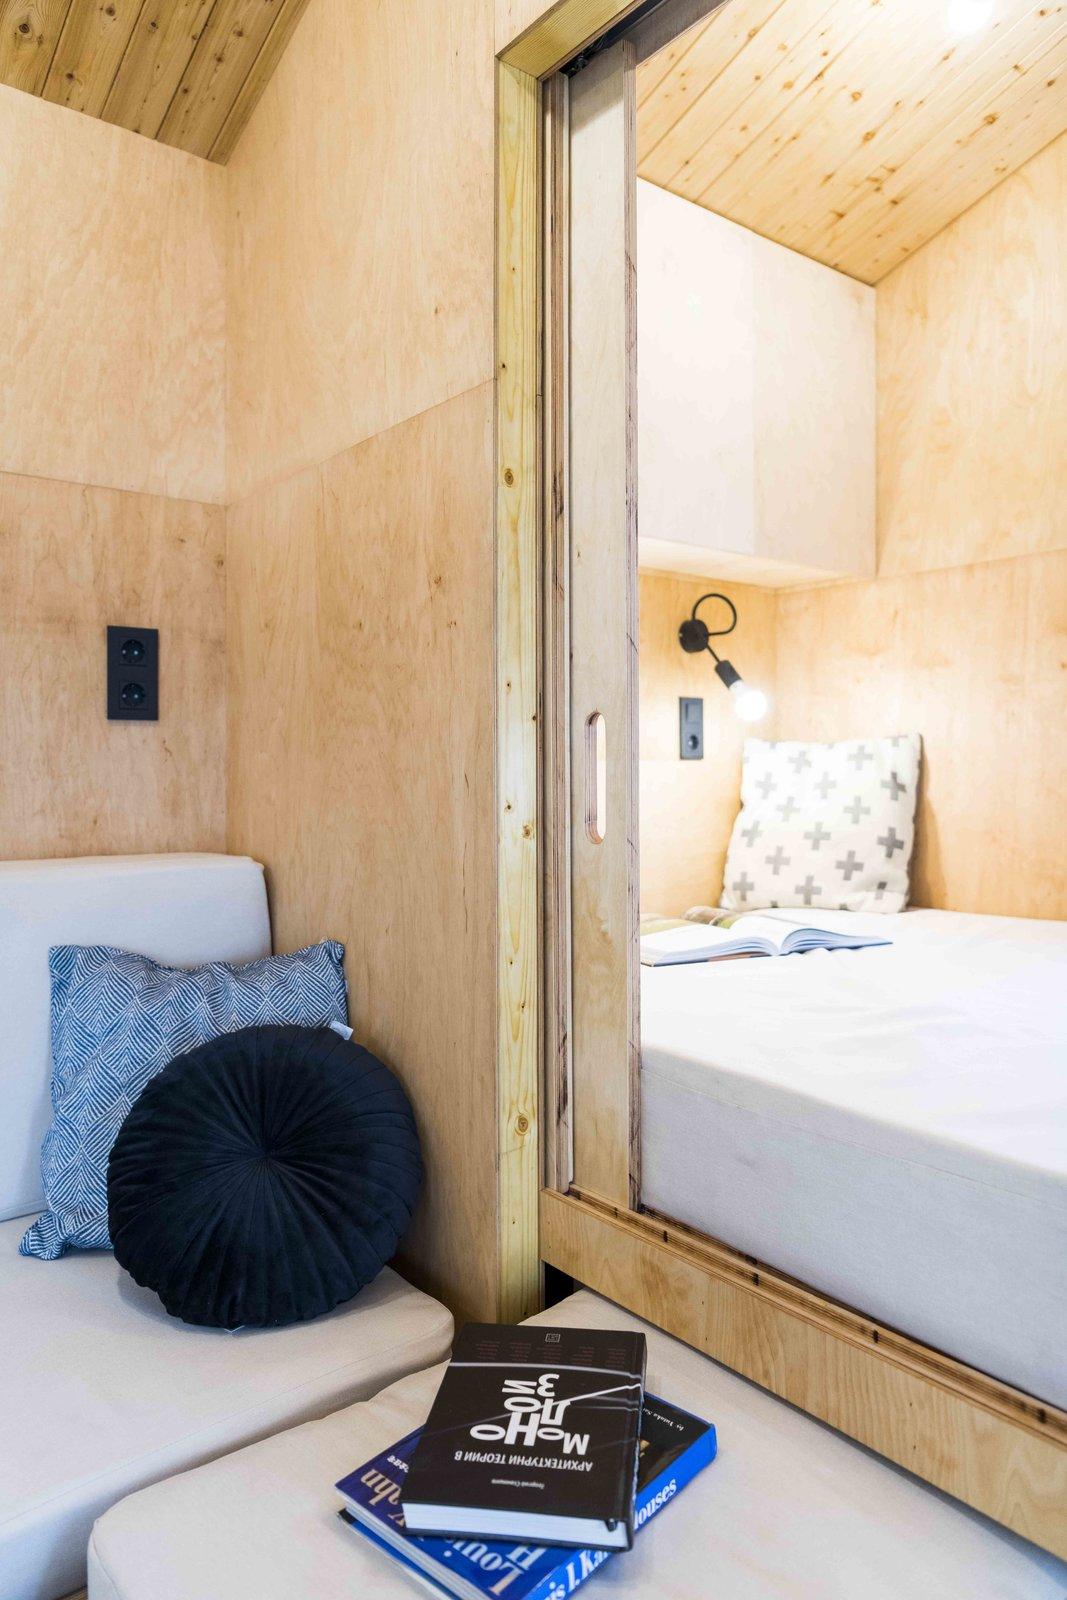 Bedroom, Wall Lighting, Bed, and Light Hardwood Floor Sliding door to separate the bedroom niche  KOLELIBA Family Tiny House